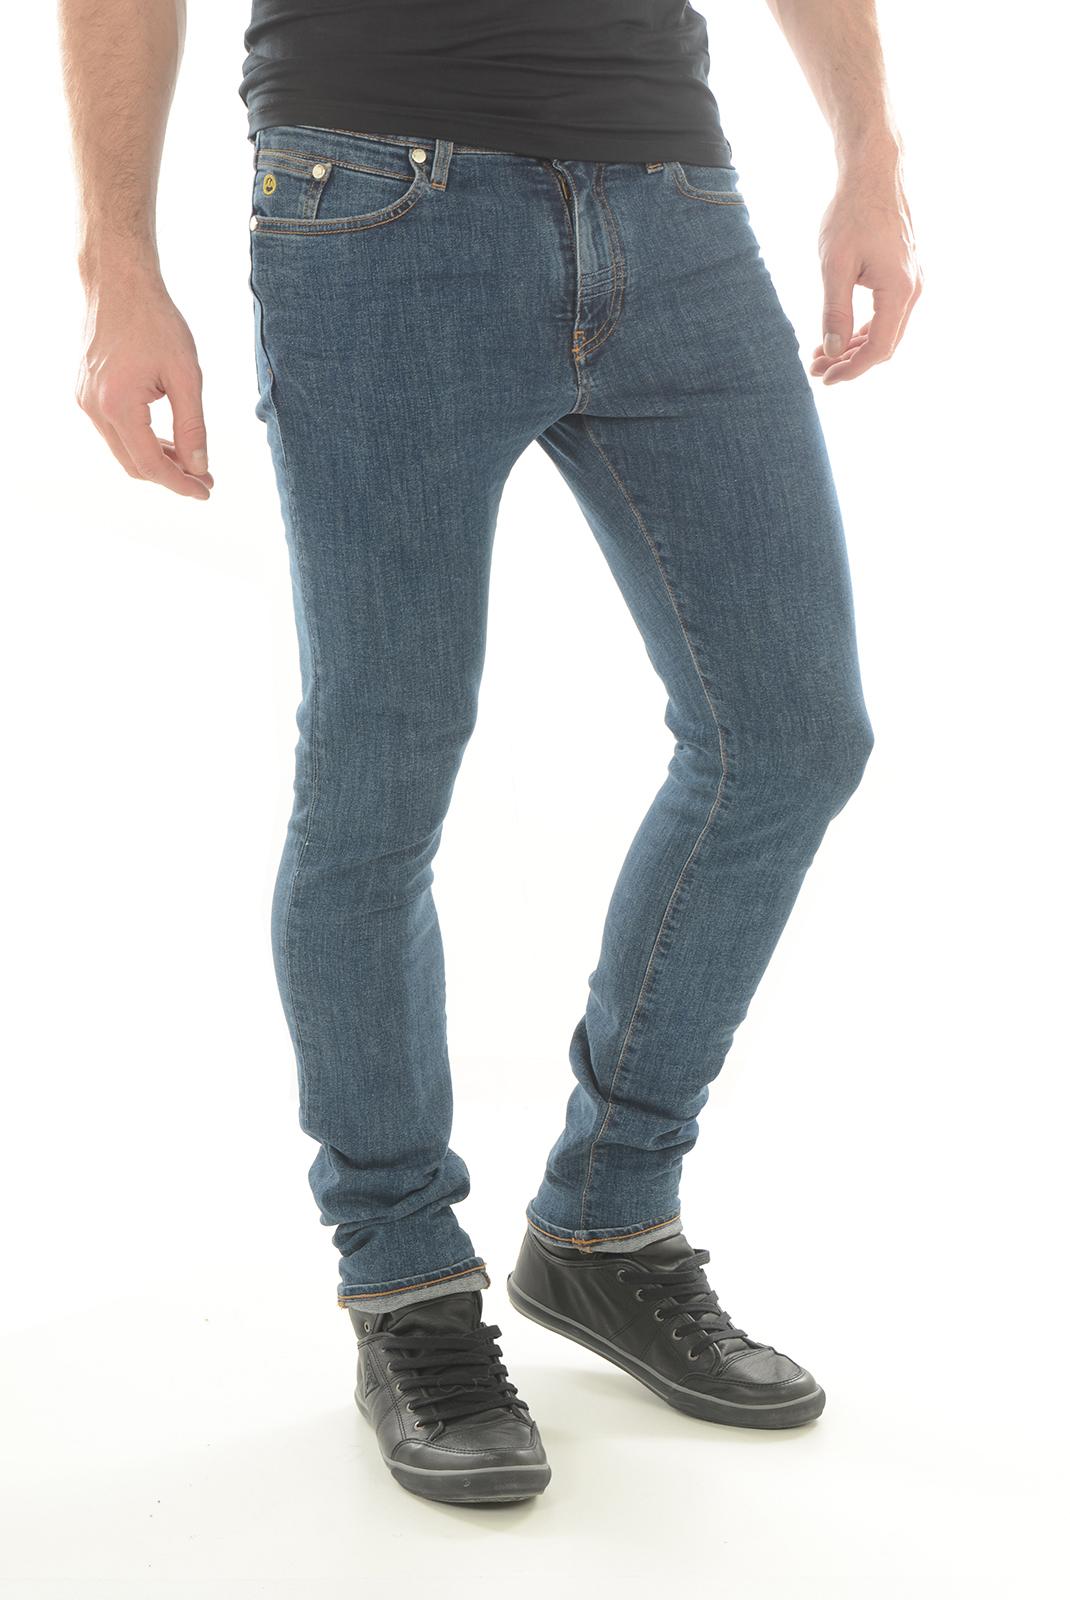 Jeans  Meltin'pot MIK D0114 DH012 BLEU BF15